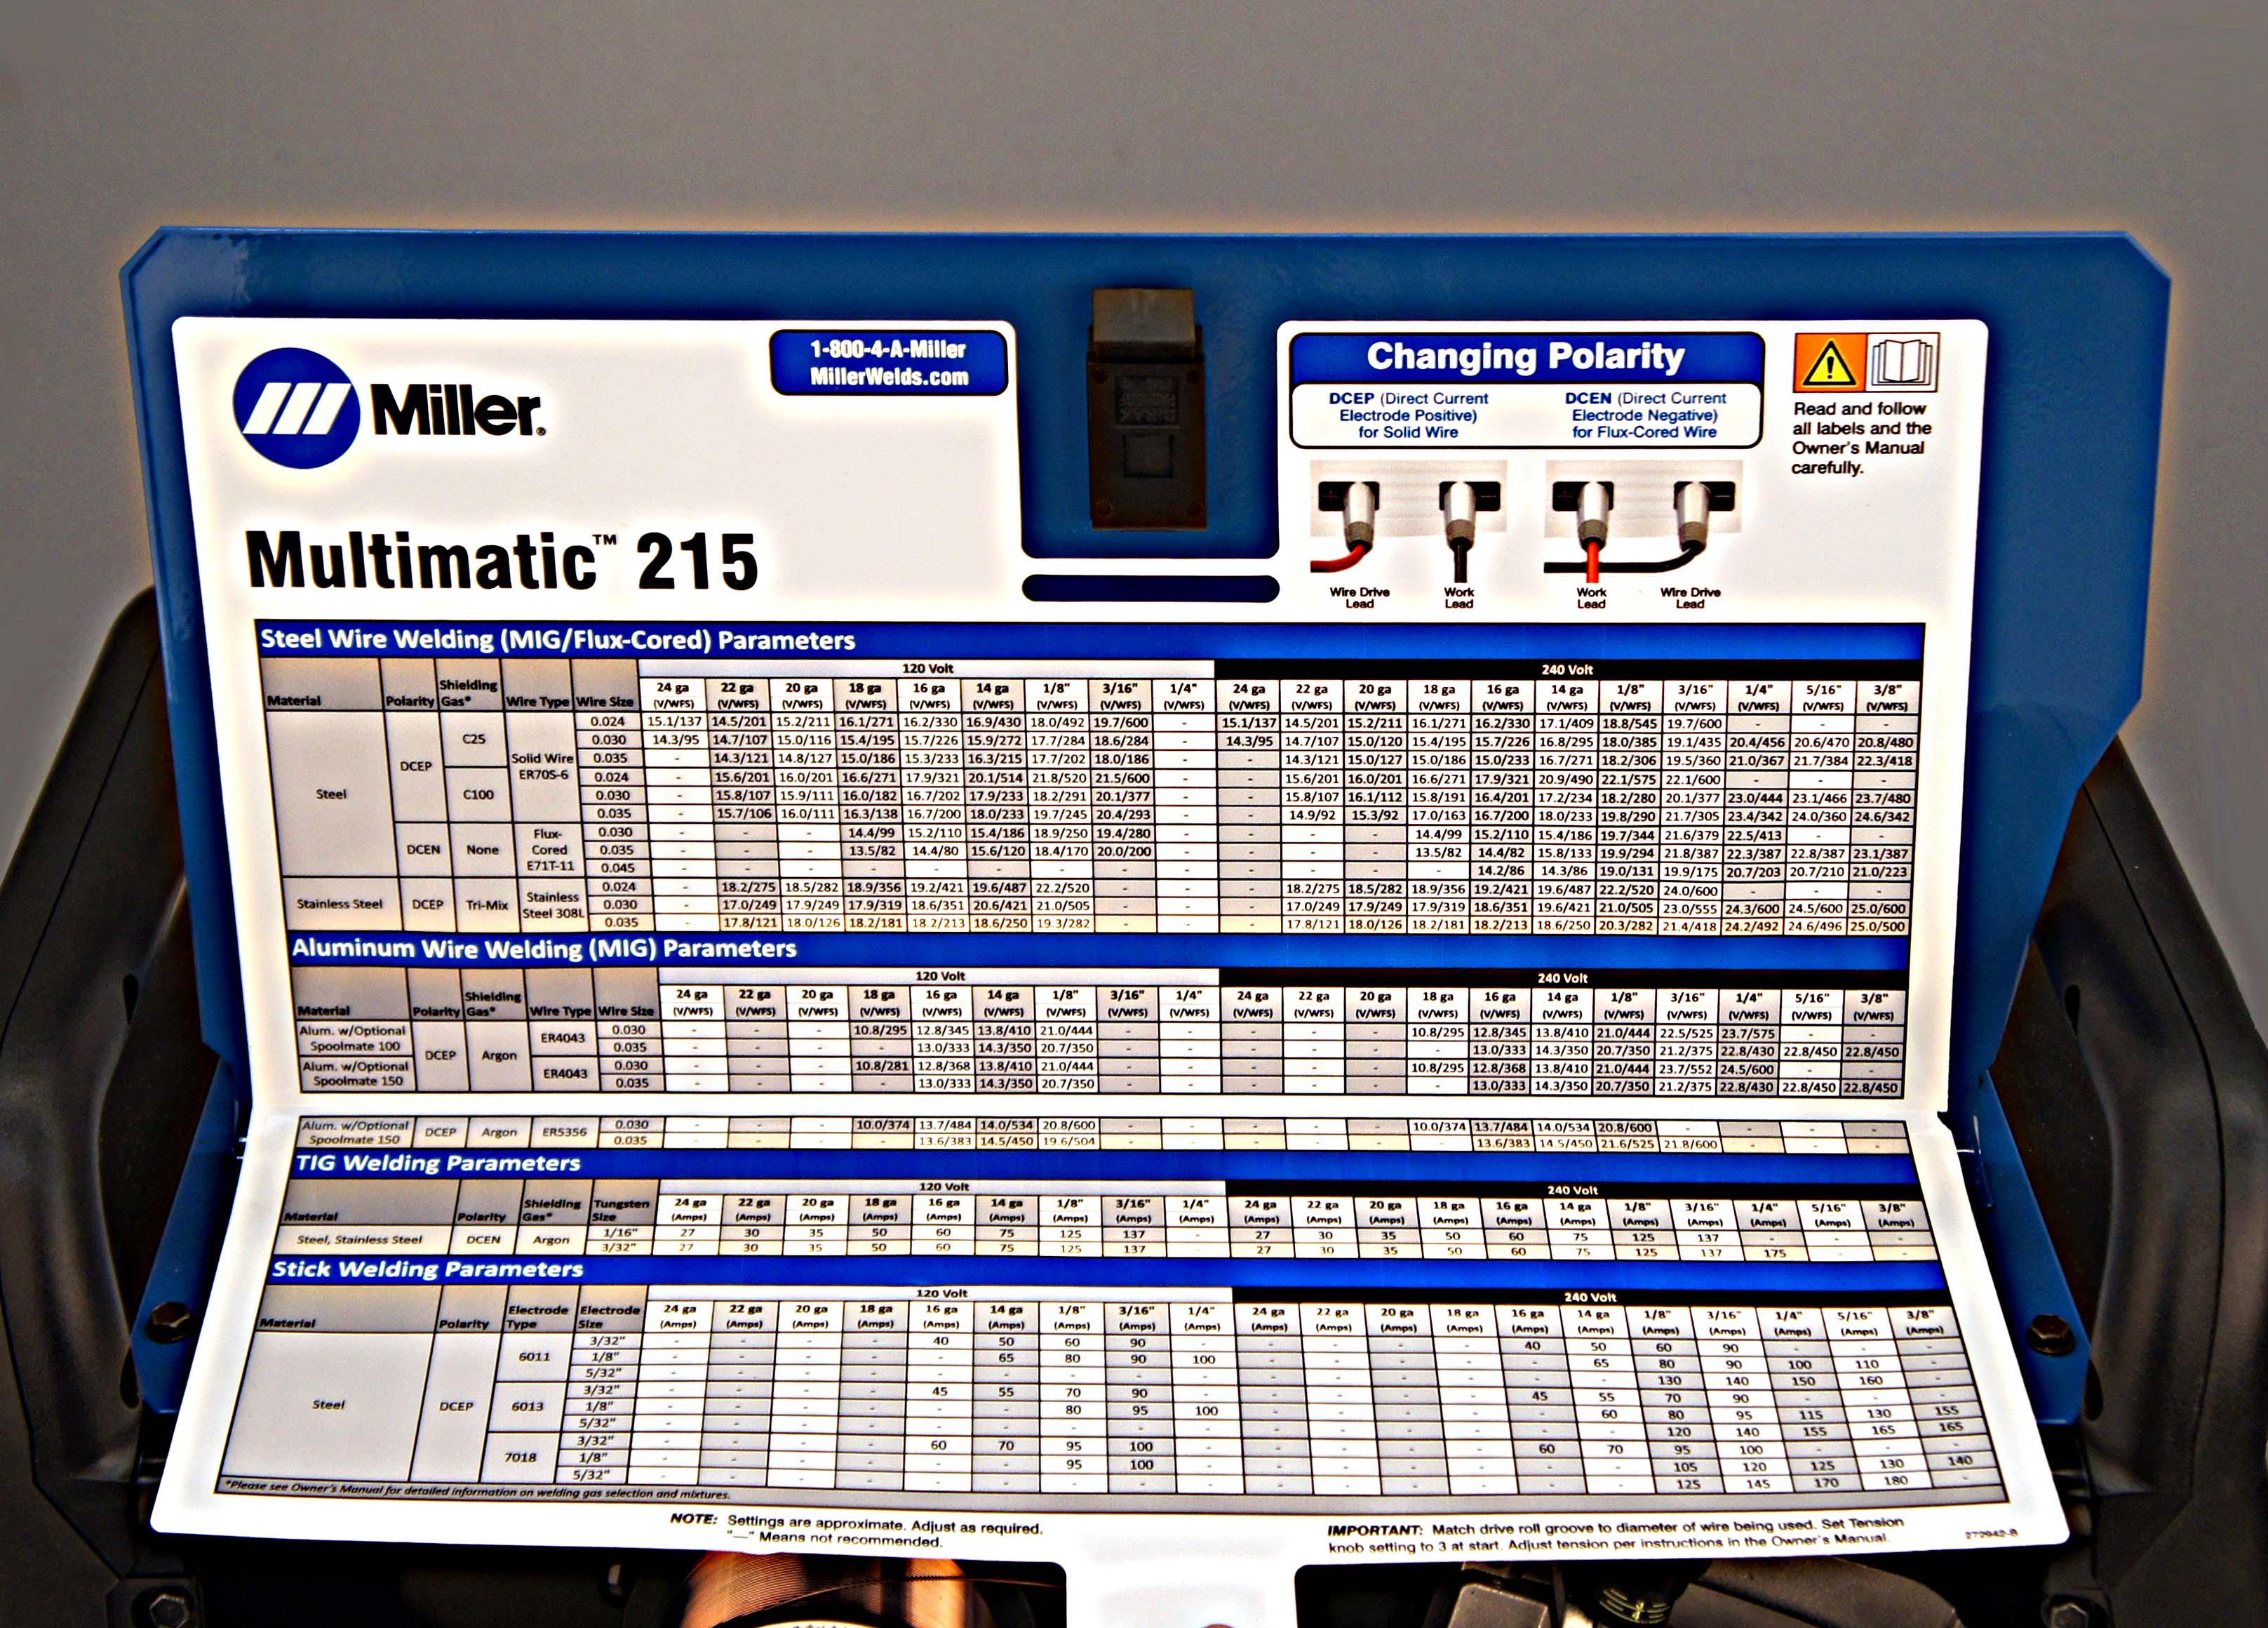 hight resolution of miller spool gun wiring diagram trusted wiring diagram miller trailblazer 250 miller 30a wiring diagram trusted